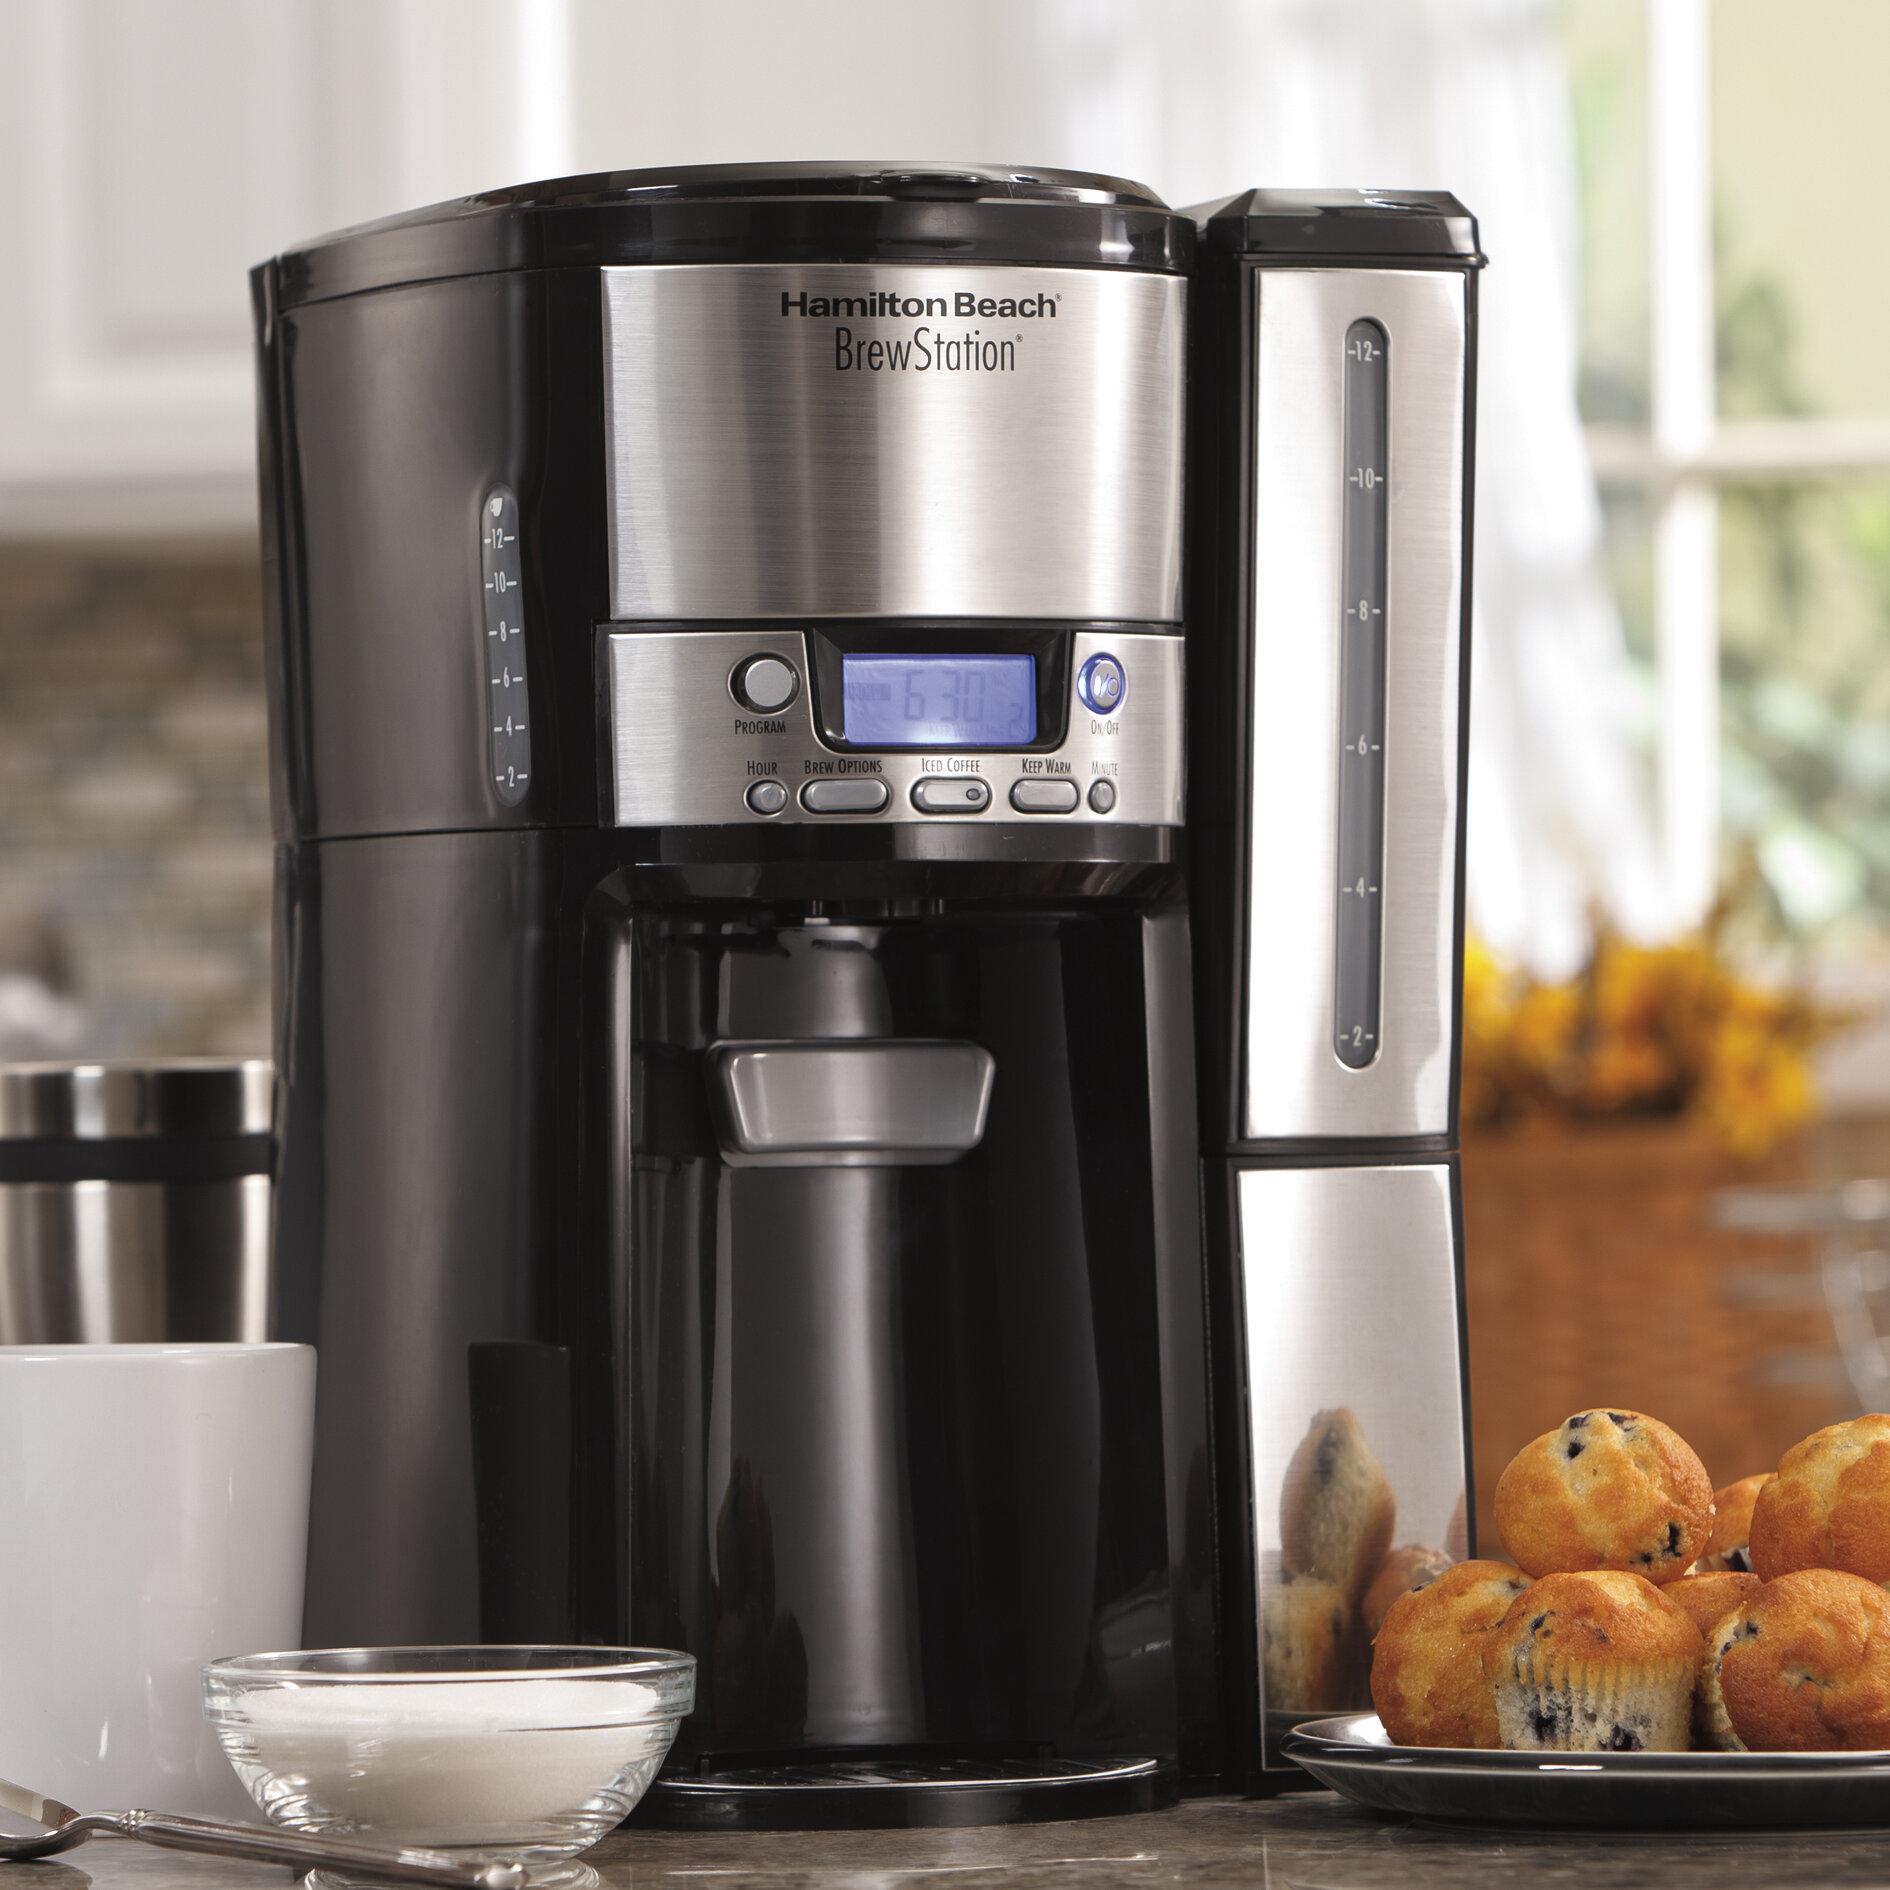 Hamilton Beach BrewStation 12-Cup Dispensing Coffee Maker & Reviews on